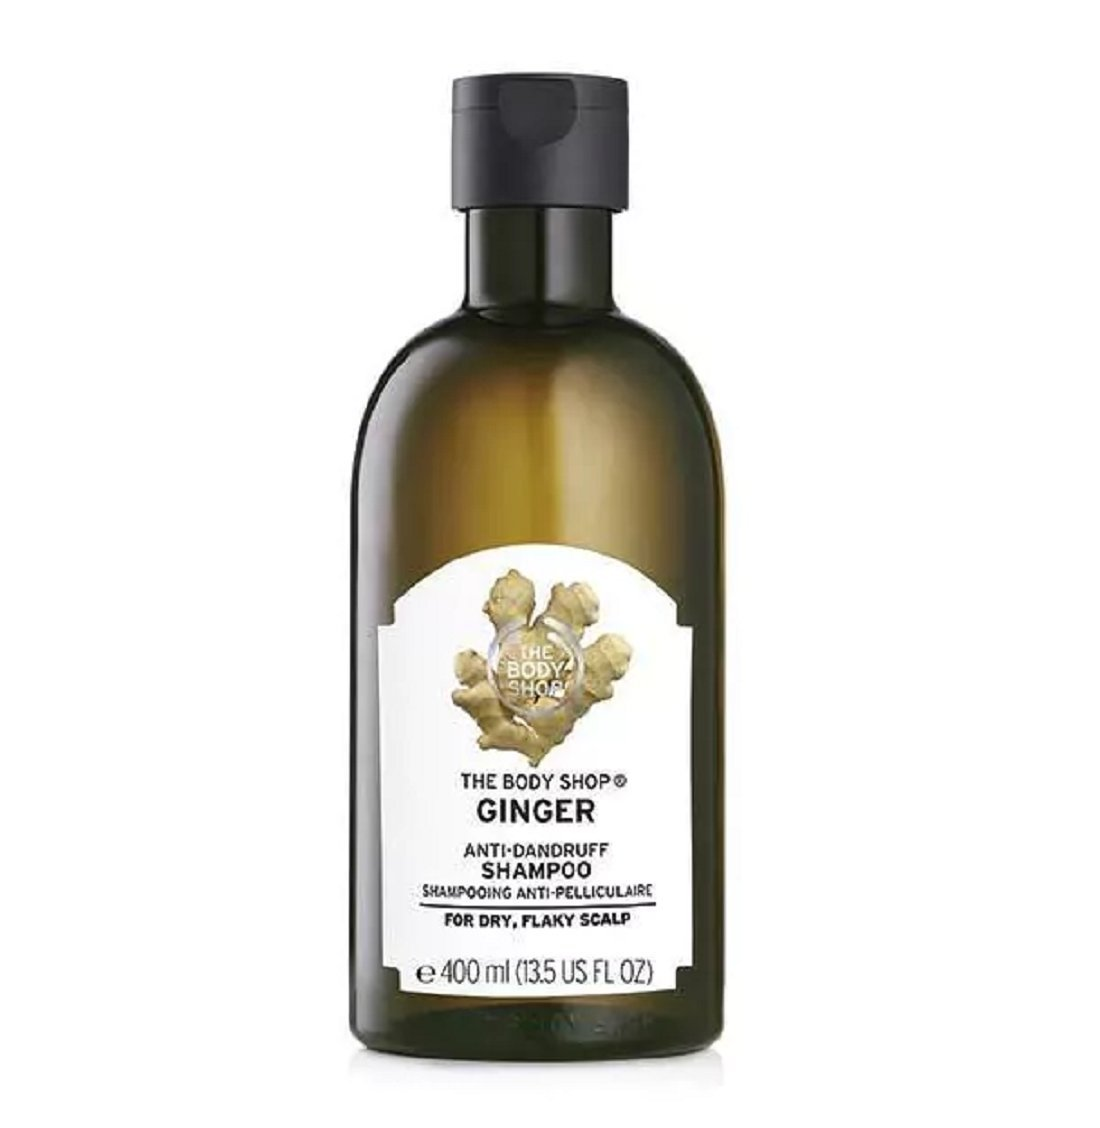 The Body Shop Ginger Anti Dandruff Shampoo - 400ml